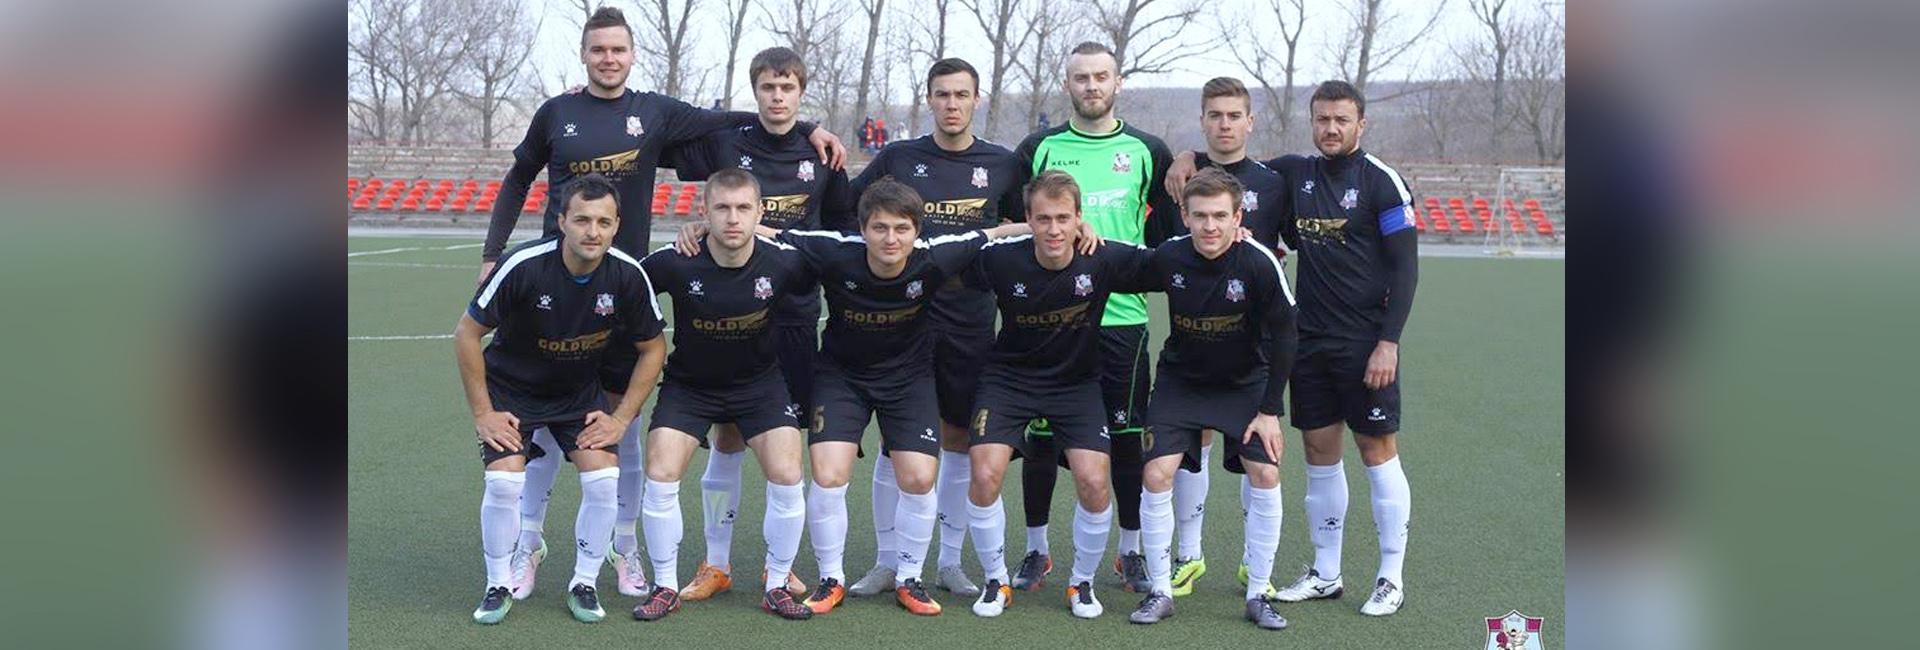 FC Sfântul Gheorghe Suruceni fotbal Divizia Națională Basarabia